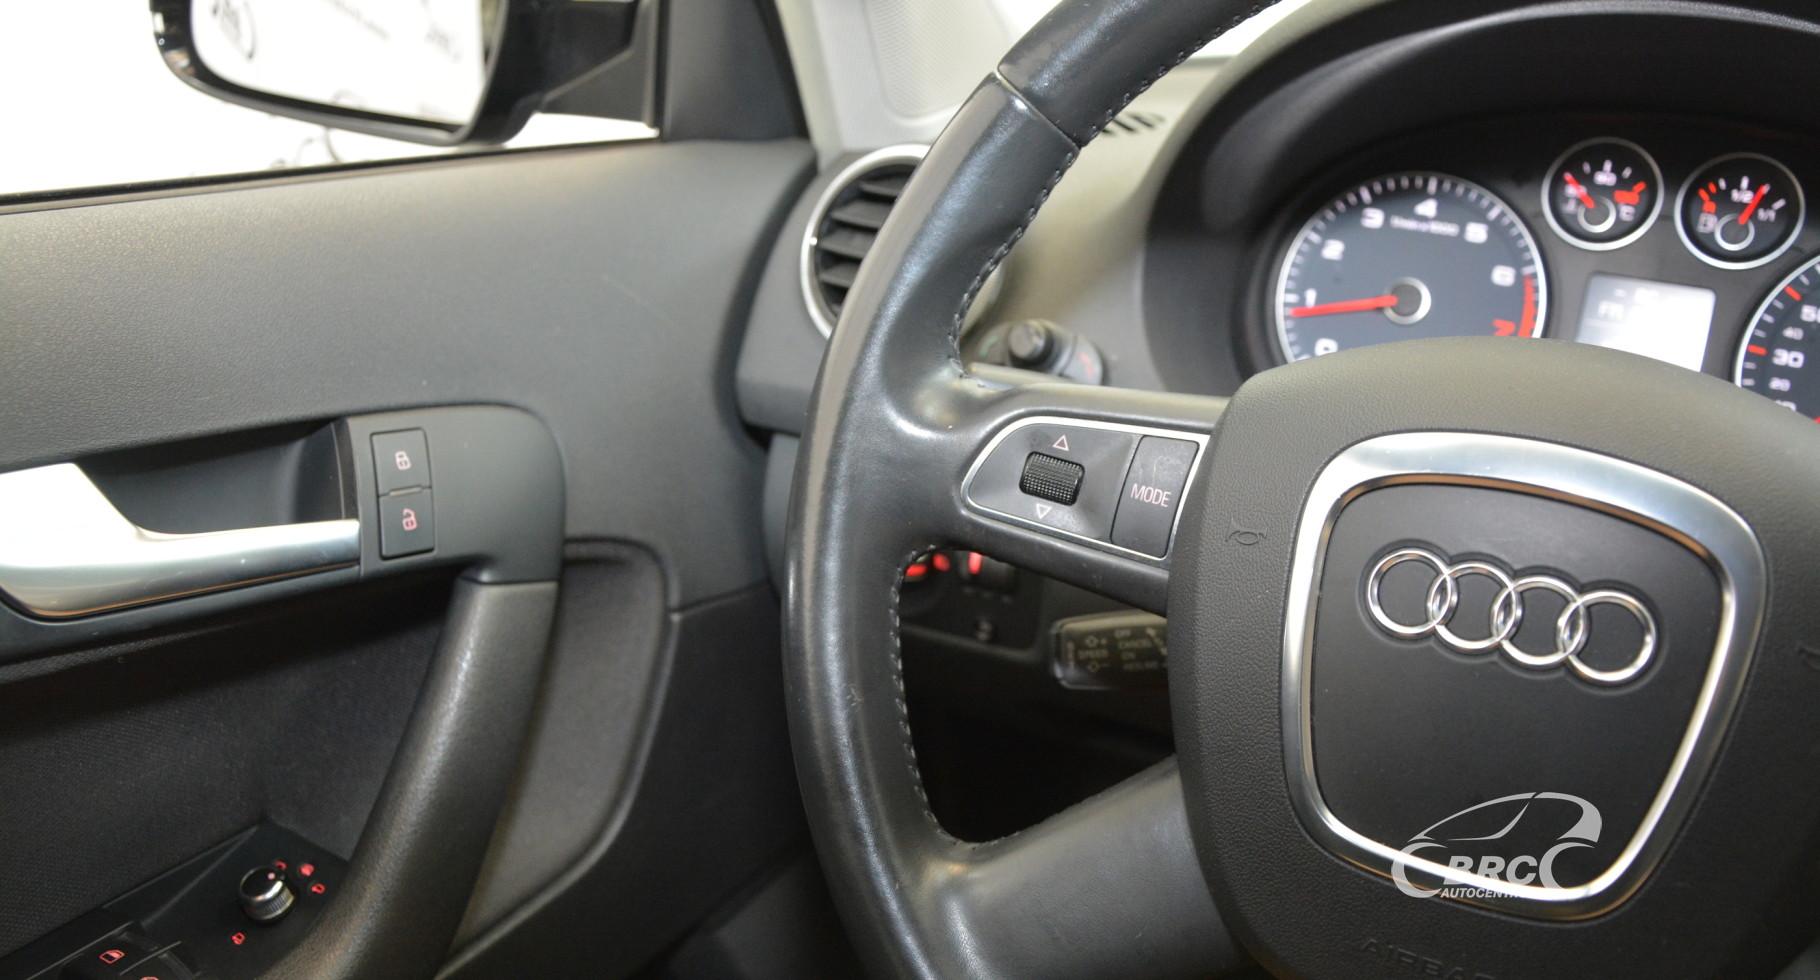 Audi A3 1.2 TFSI Sportback Automatas